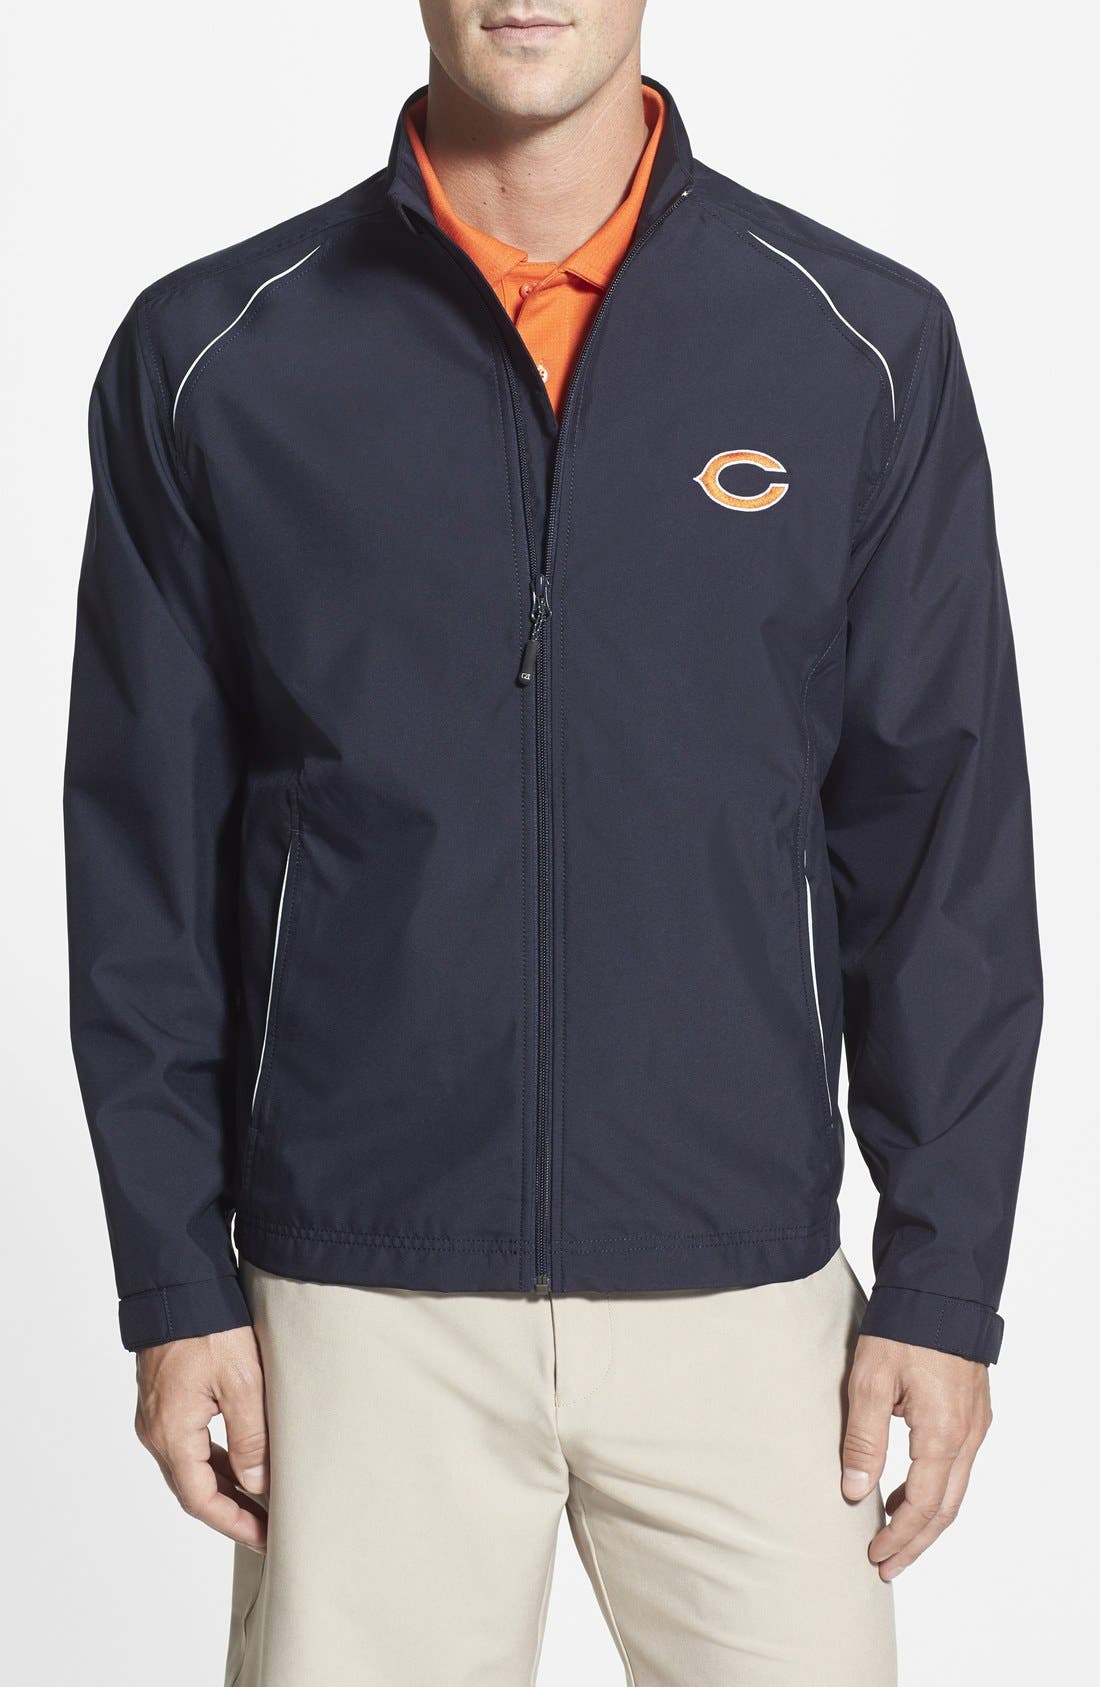 'Chicago Bears - Beacon' WeatherTec Wind & Water Resistant Jacket,                         Main,                         color, 410